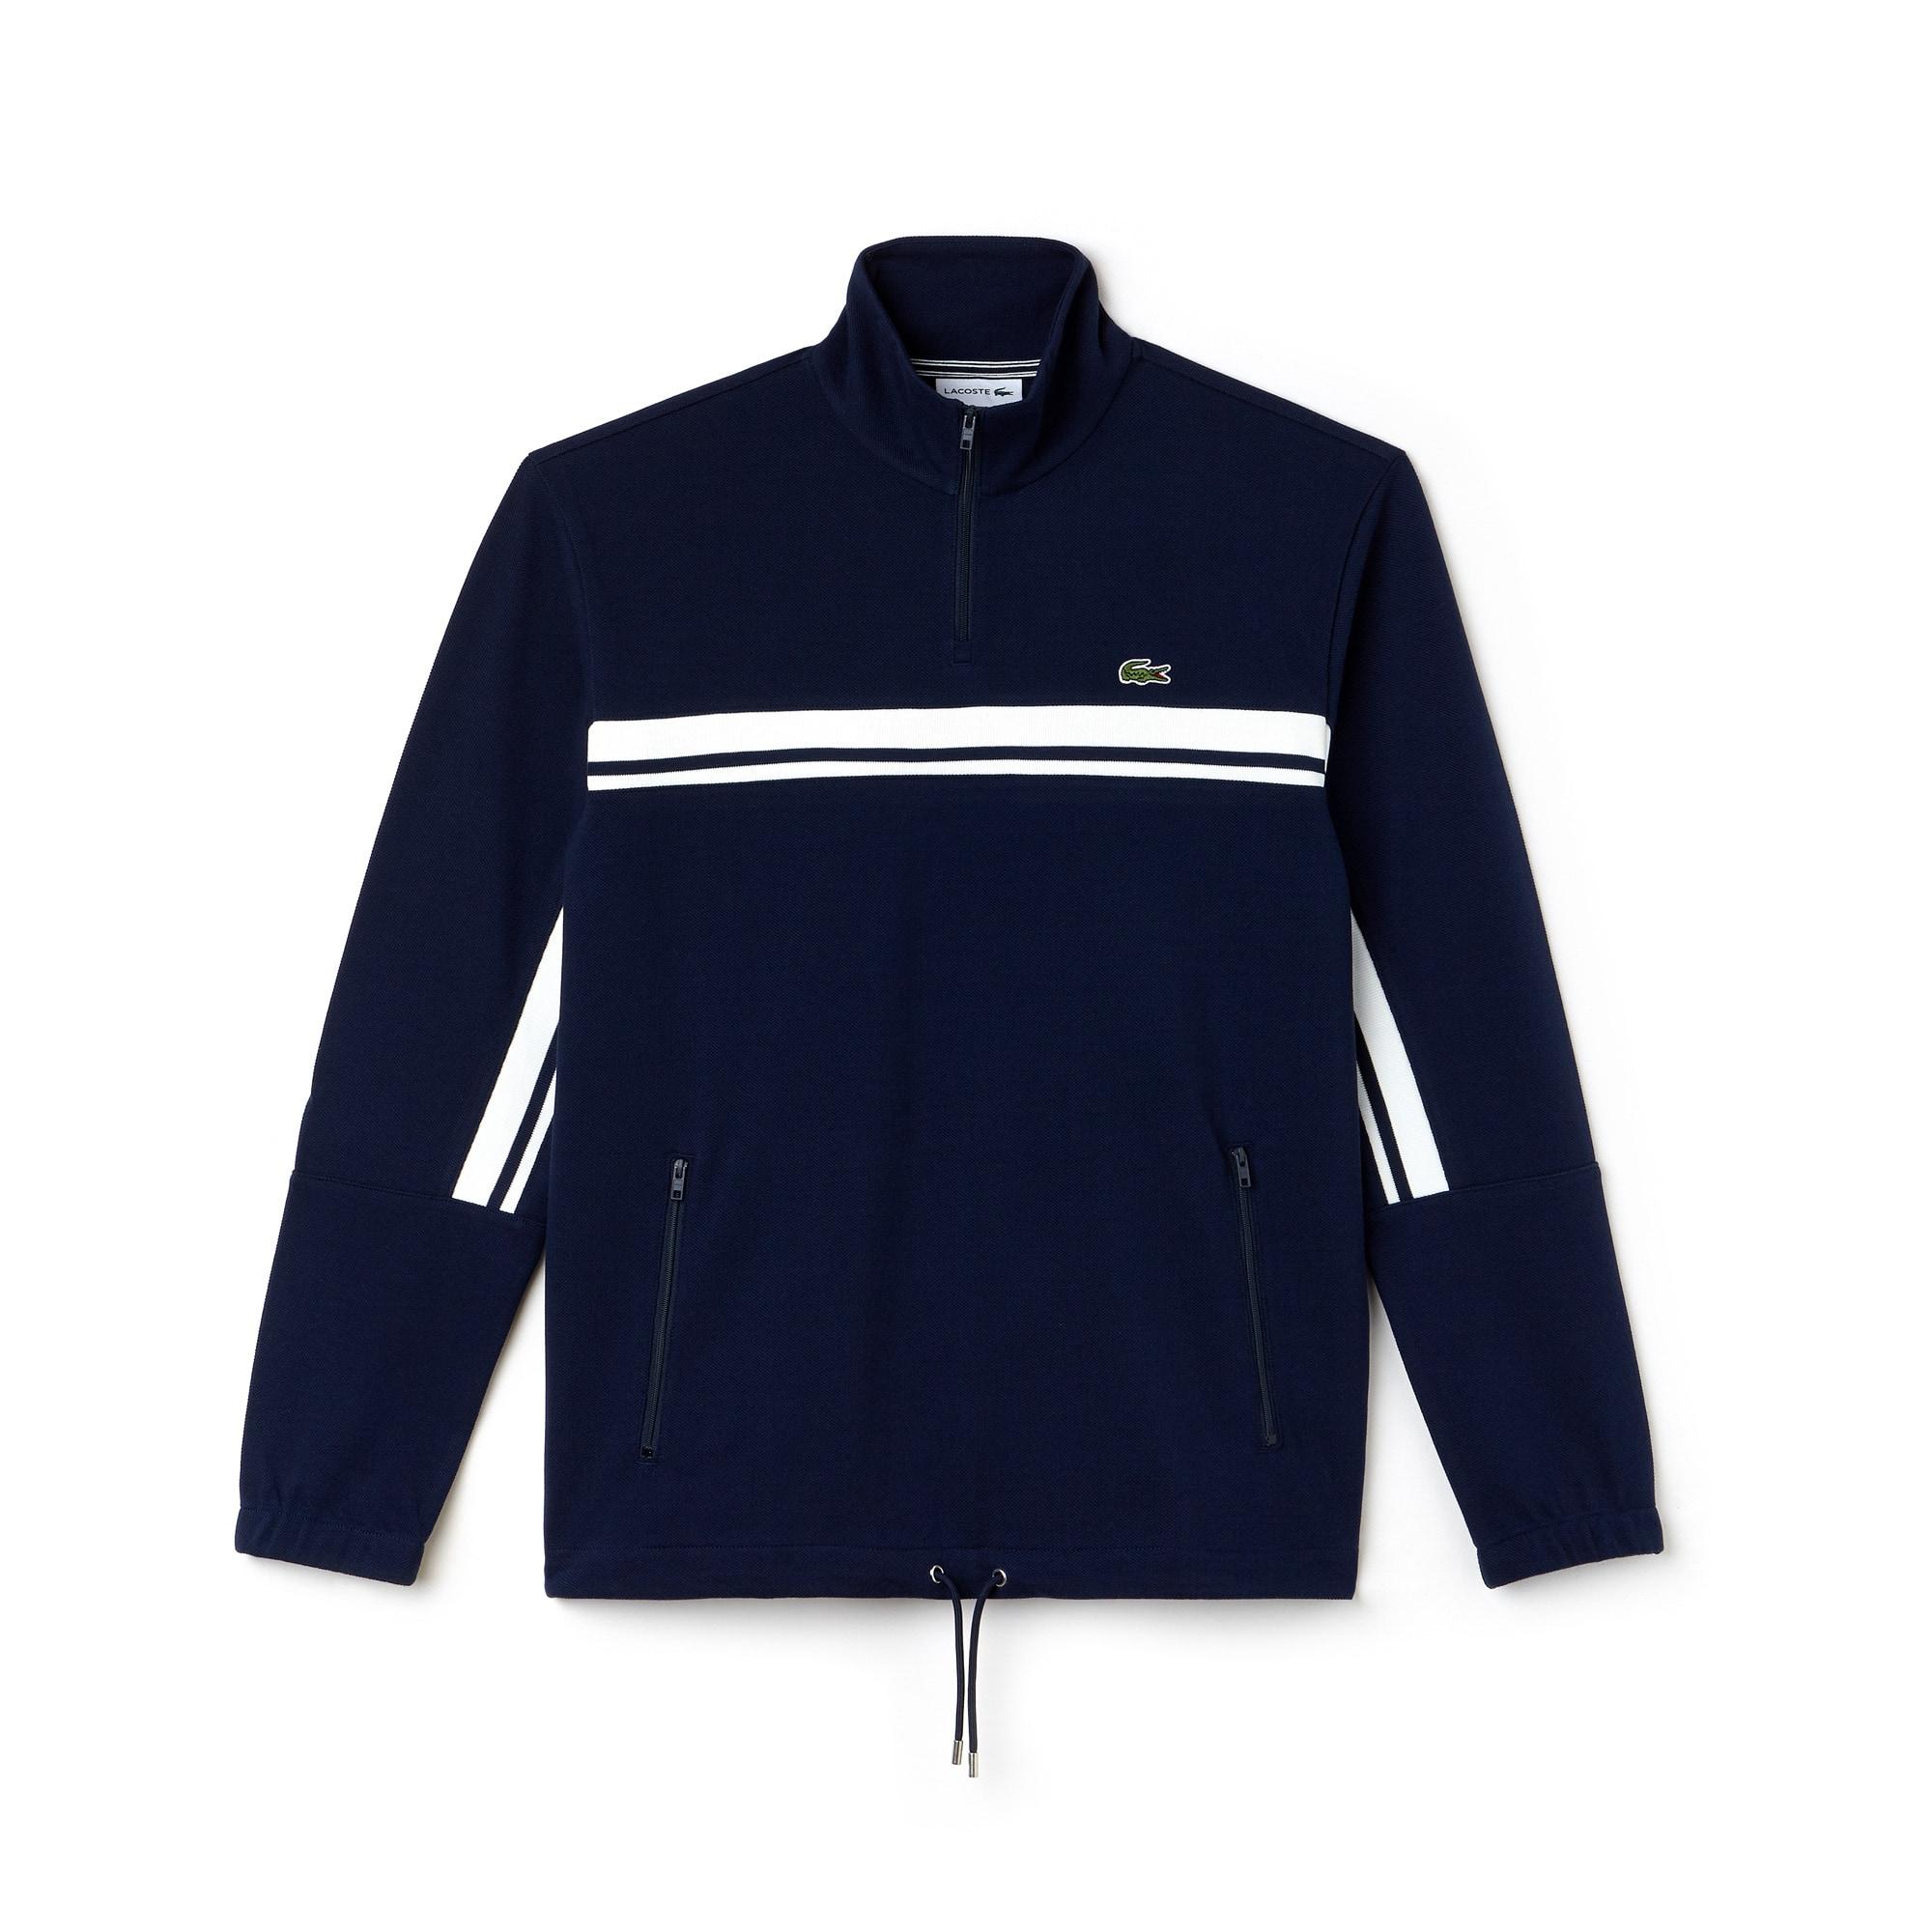 Men's Zip Stand-Up Collar Colorblock Bands Piqué Sweater